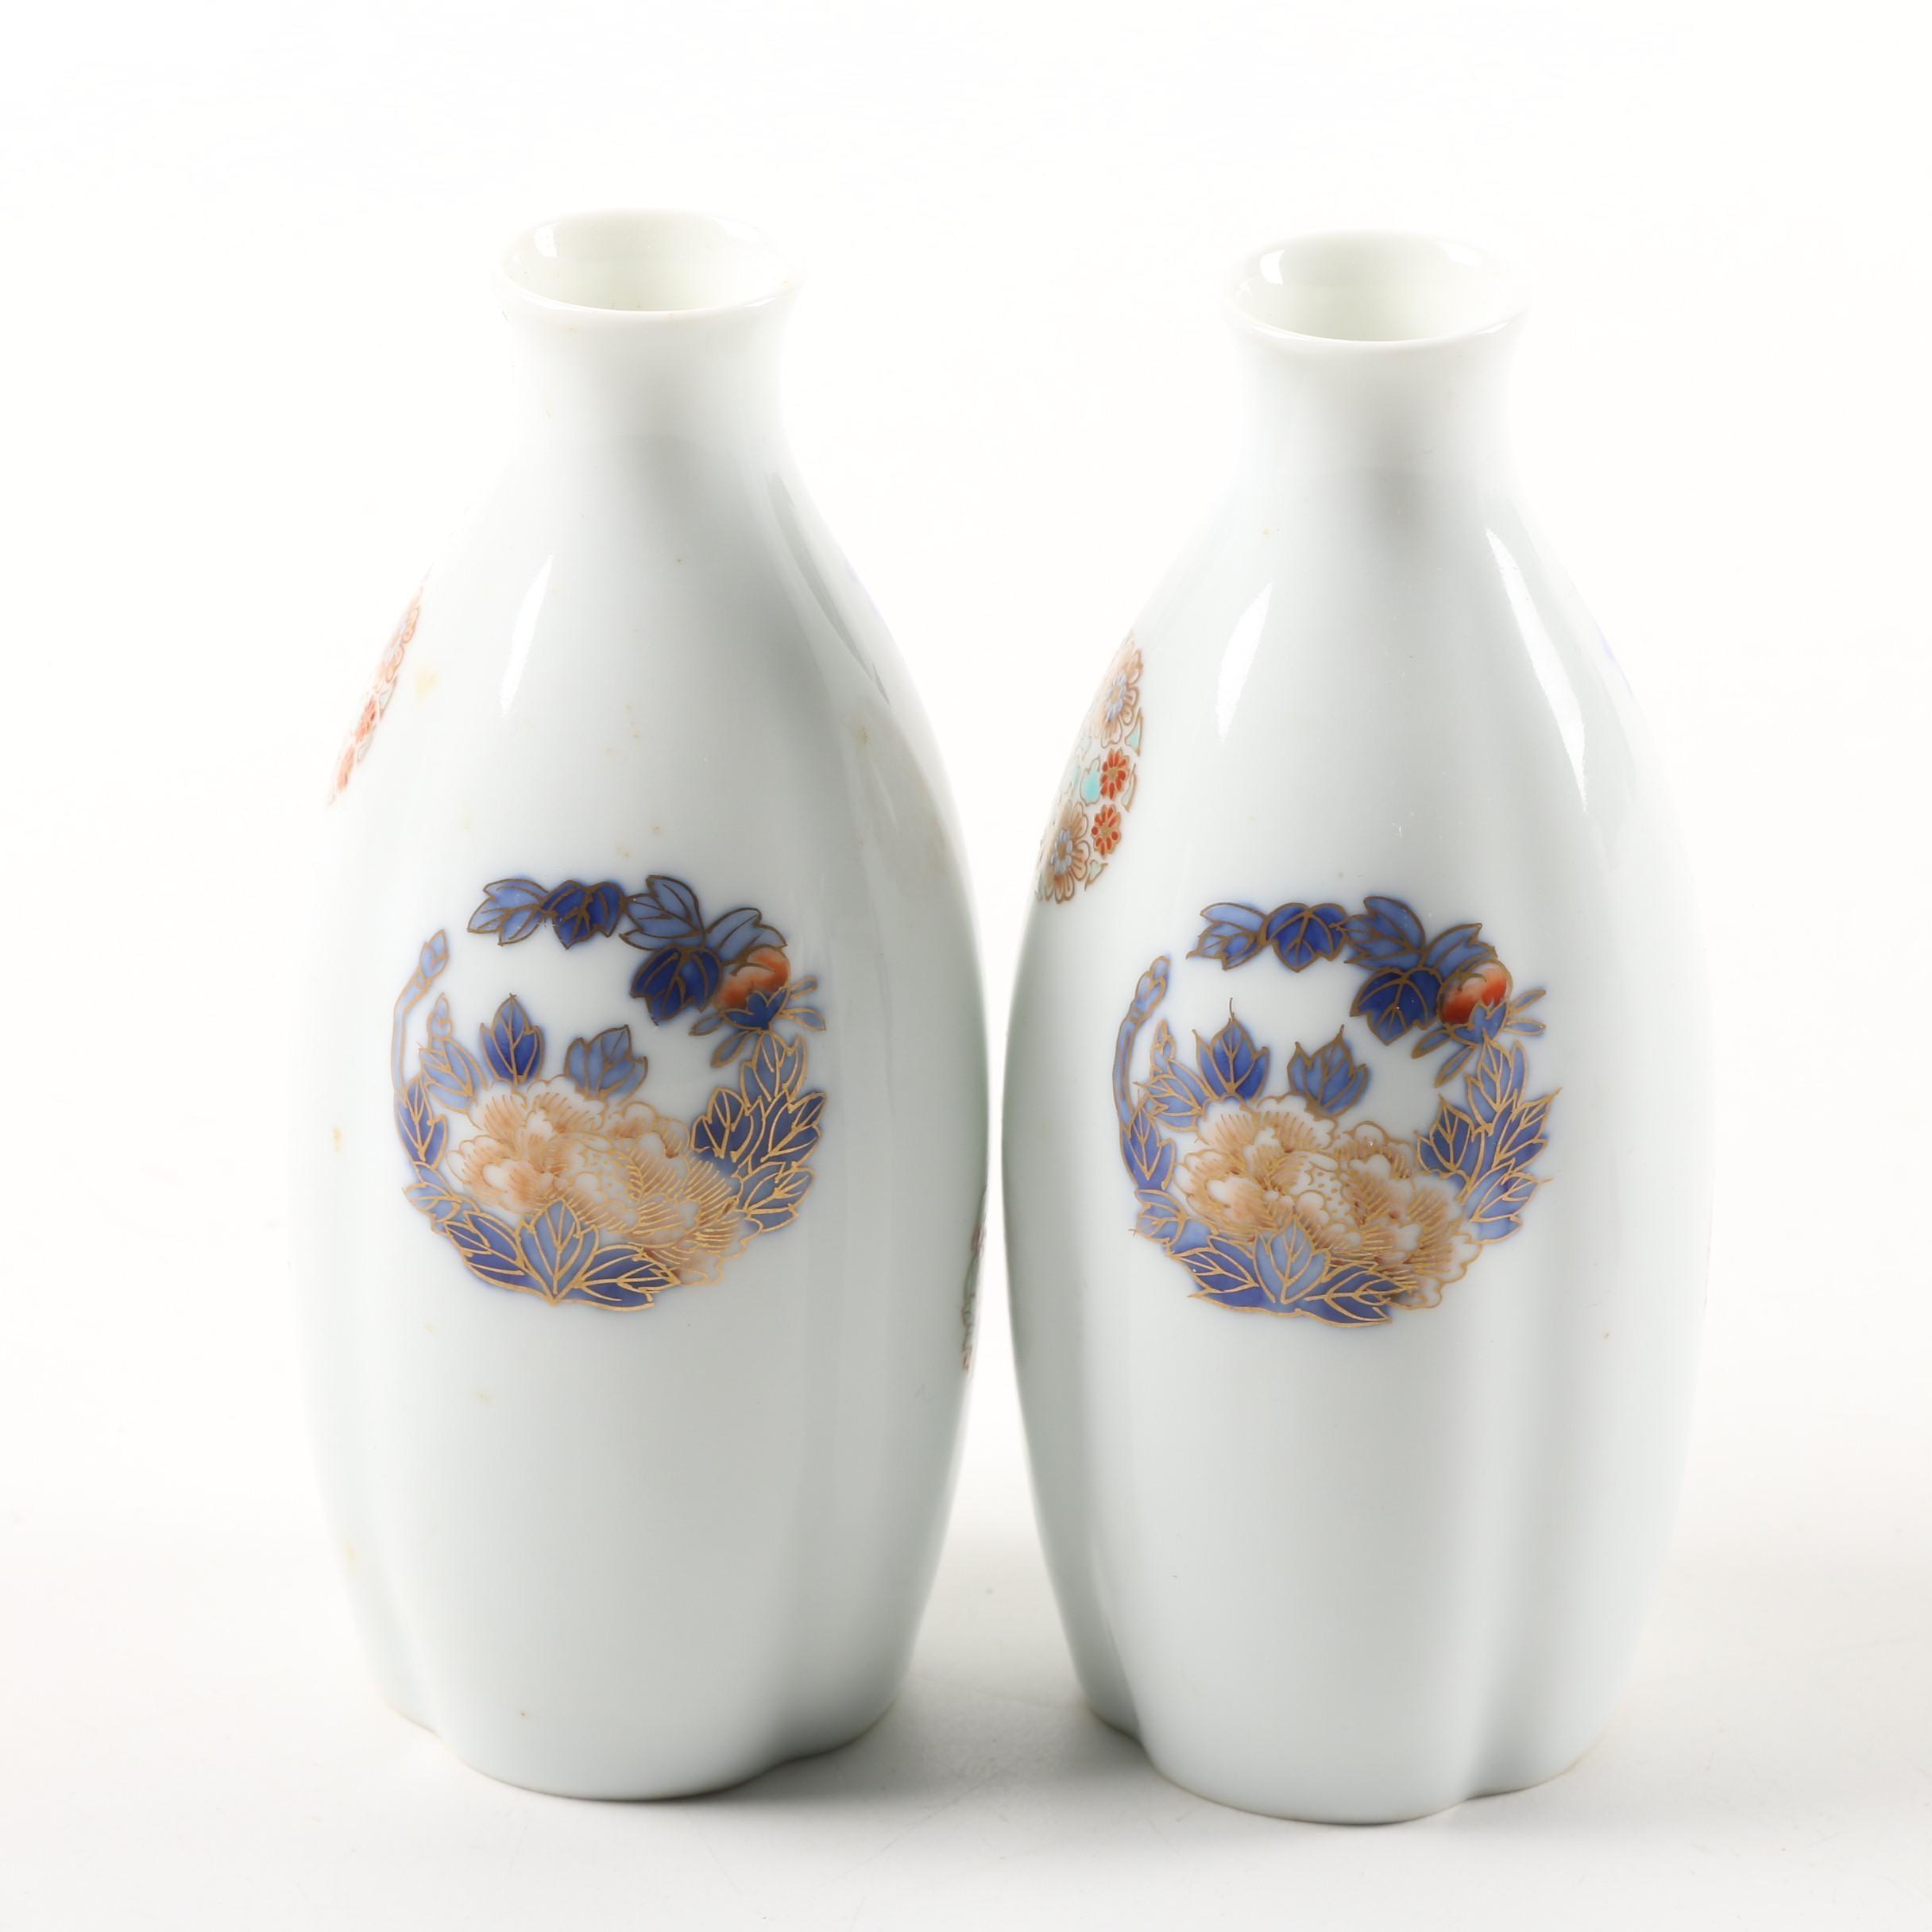 Vintage Japanese Hand-Painted Porcelain Vases